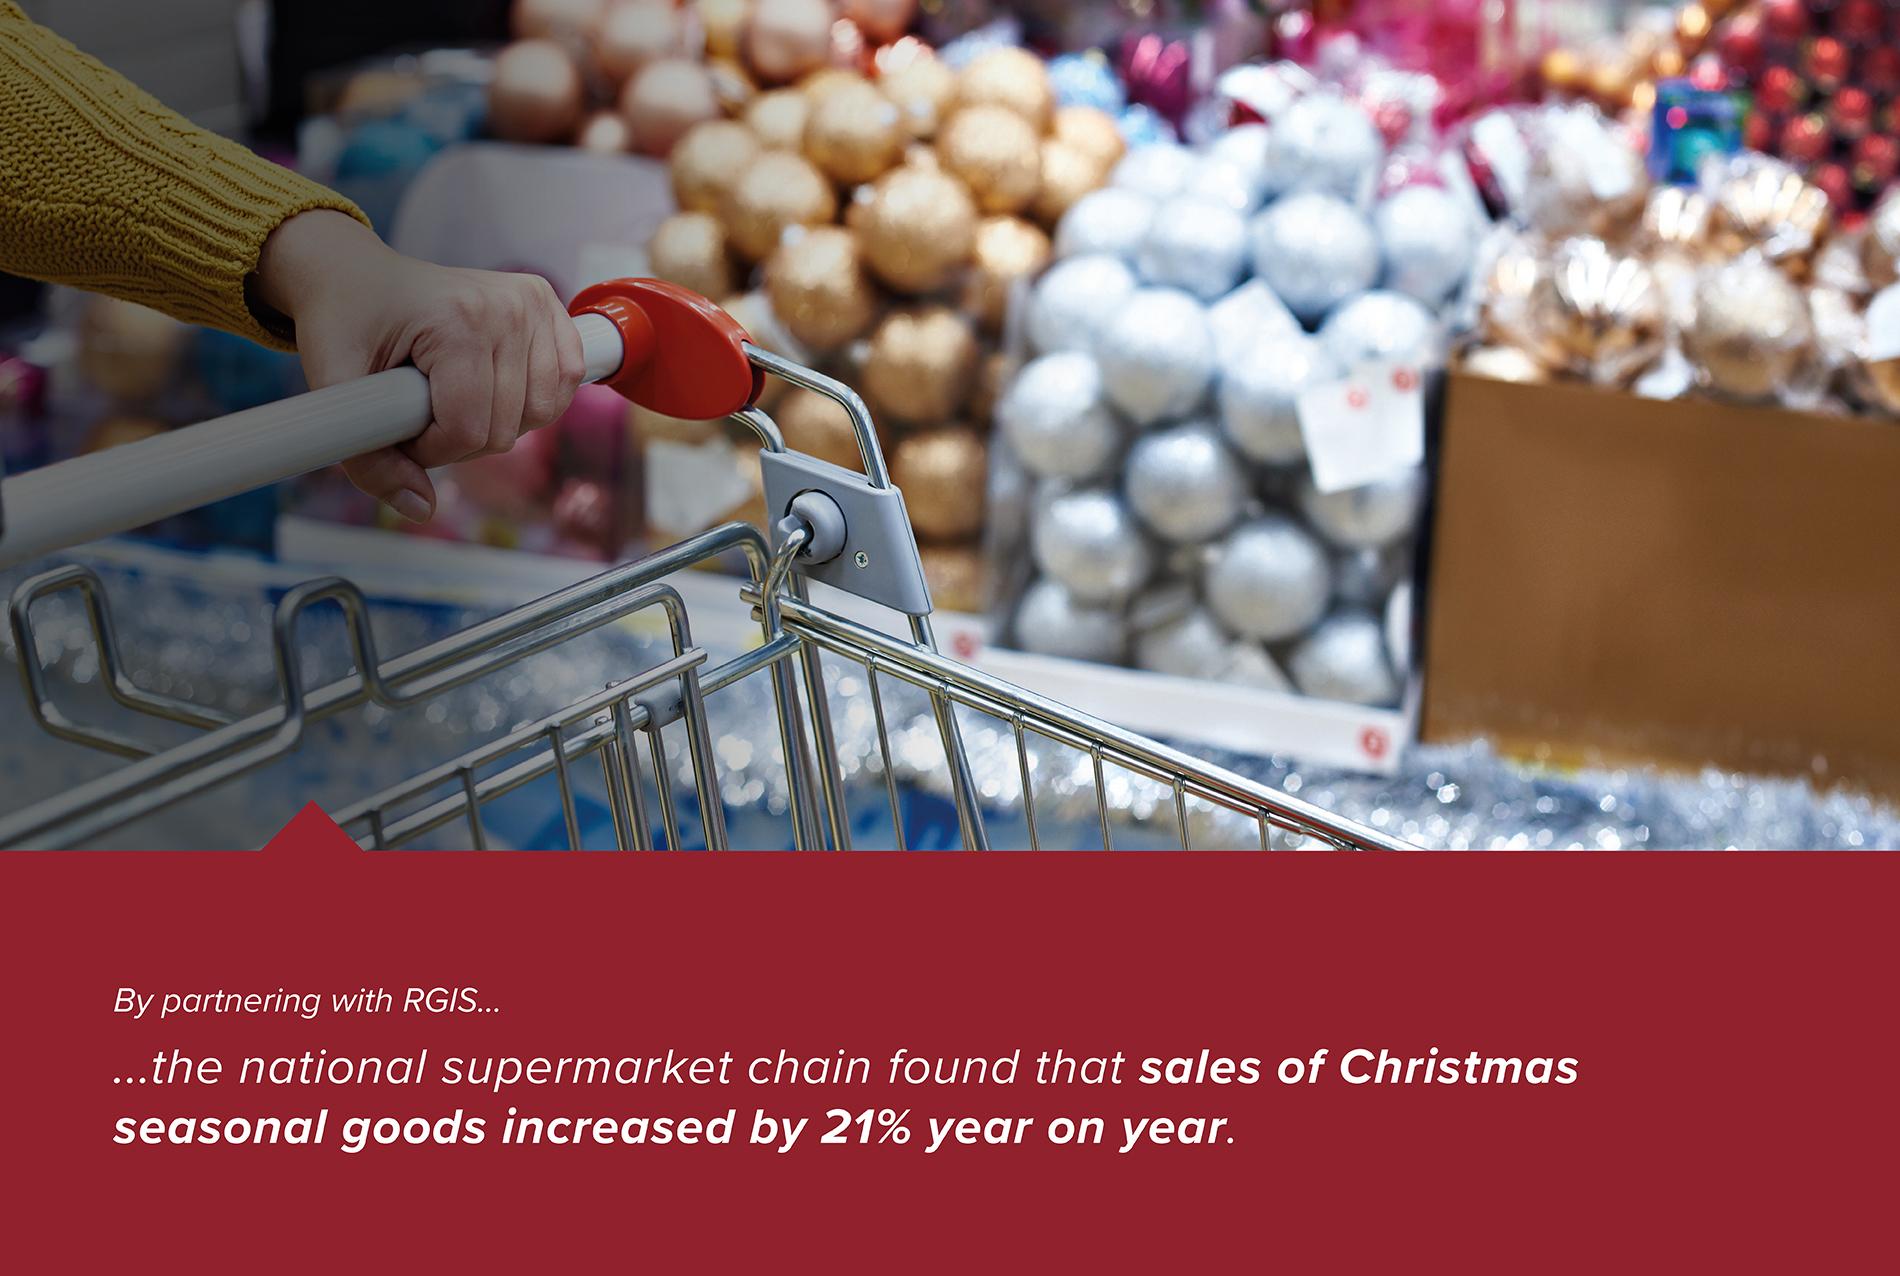 Focused Stock Count of Seasonal Goods